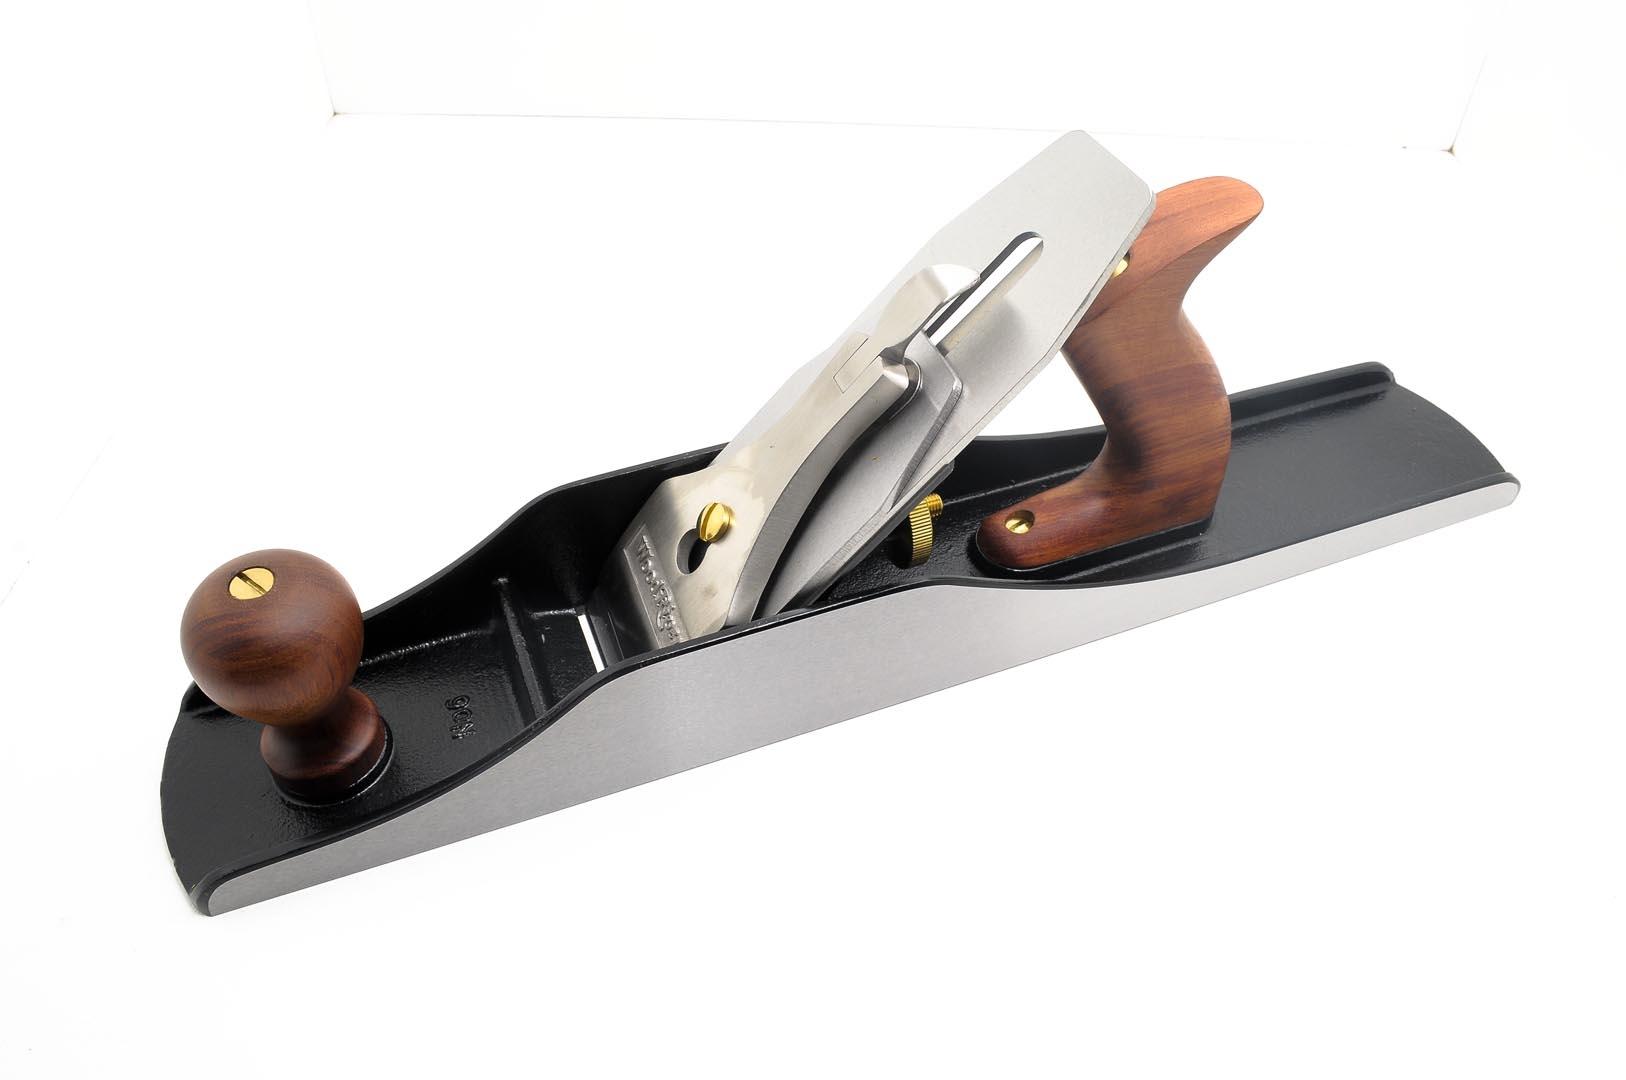 Cepillo garlopa 6 para madera fina woodriver 150876 - Cepillo madera electrico ...